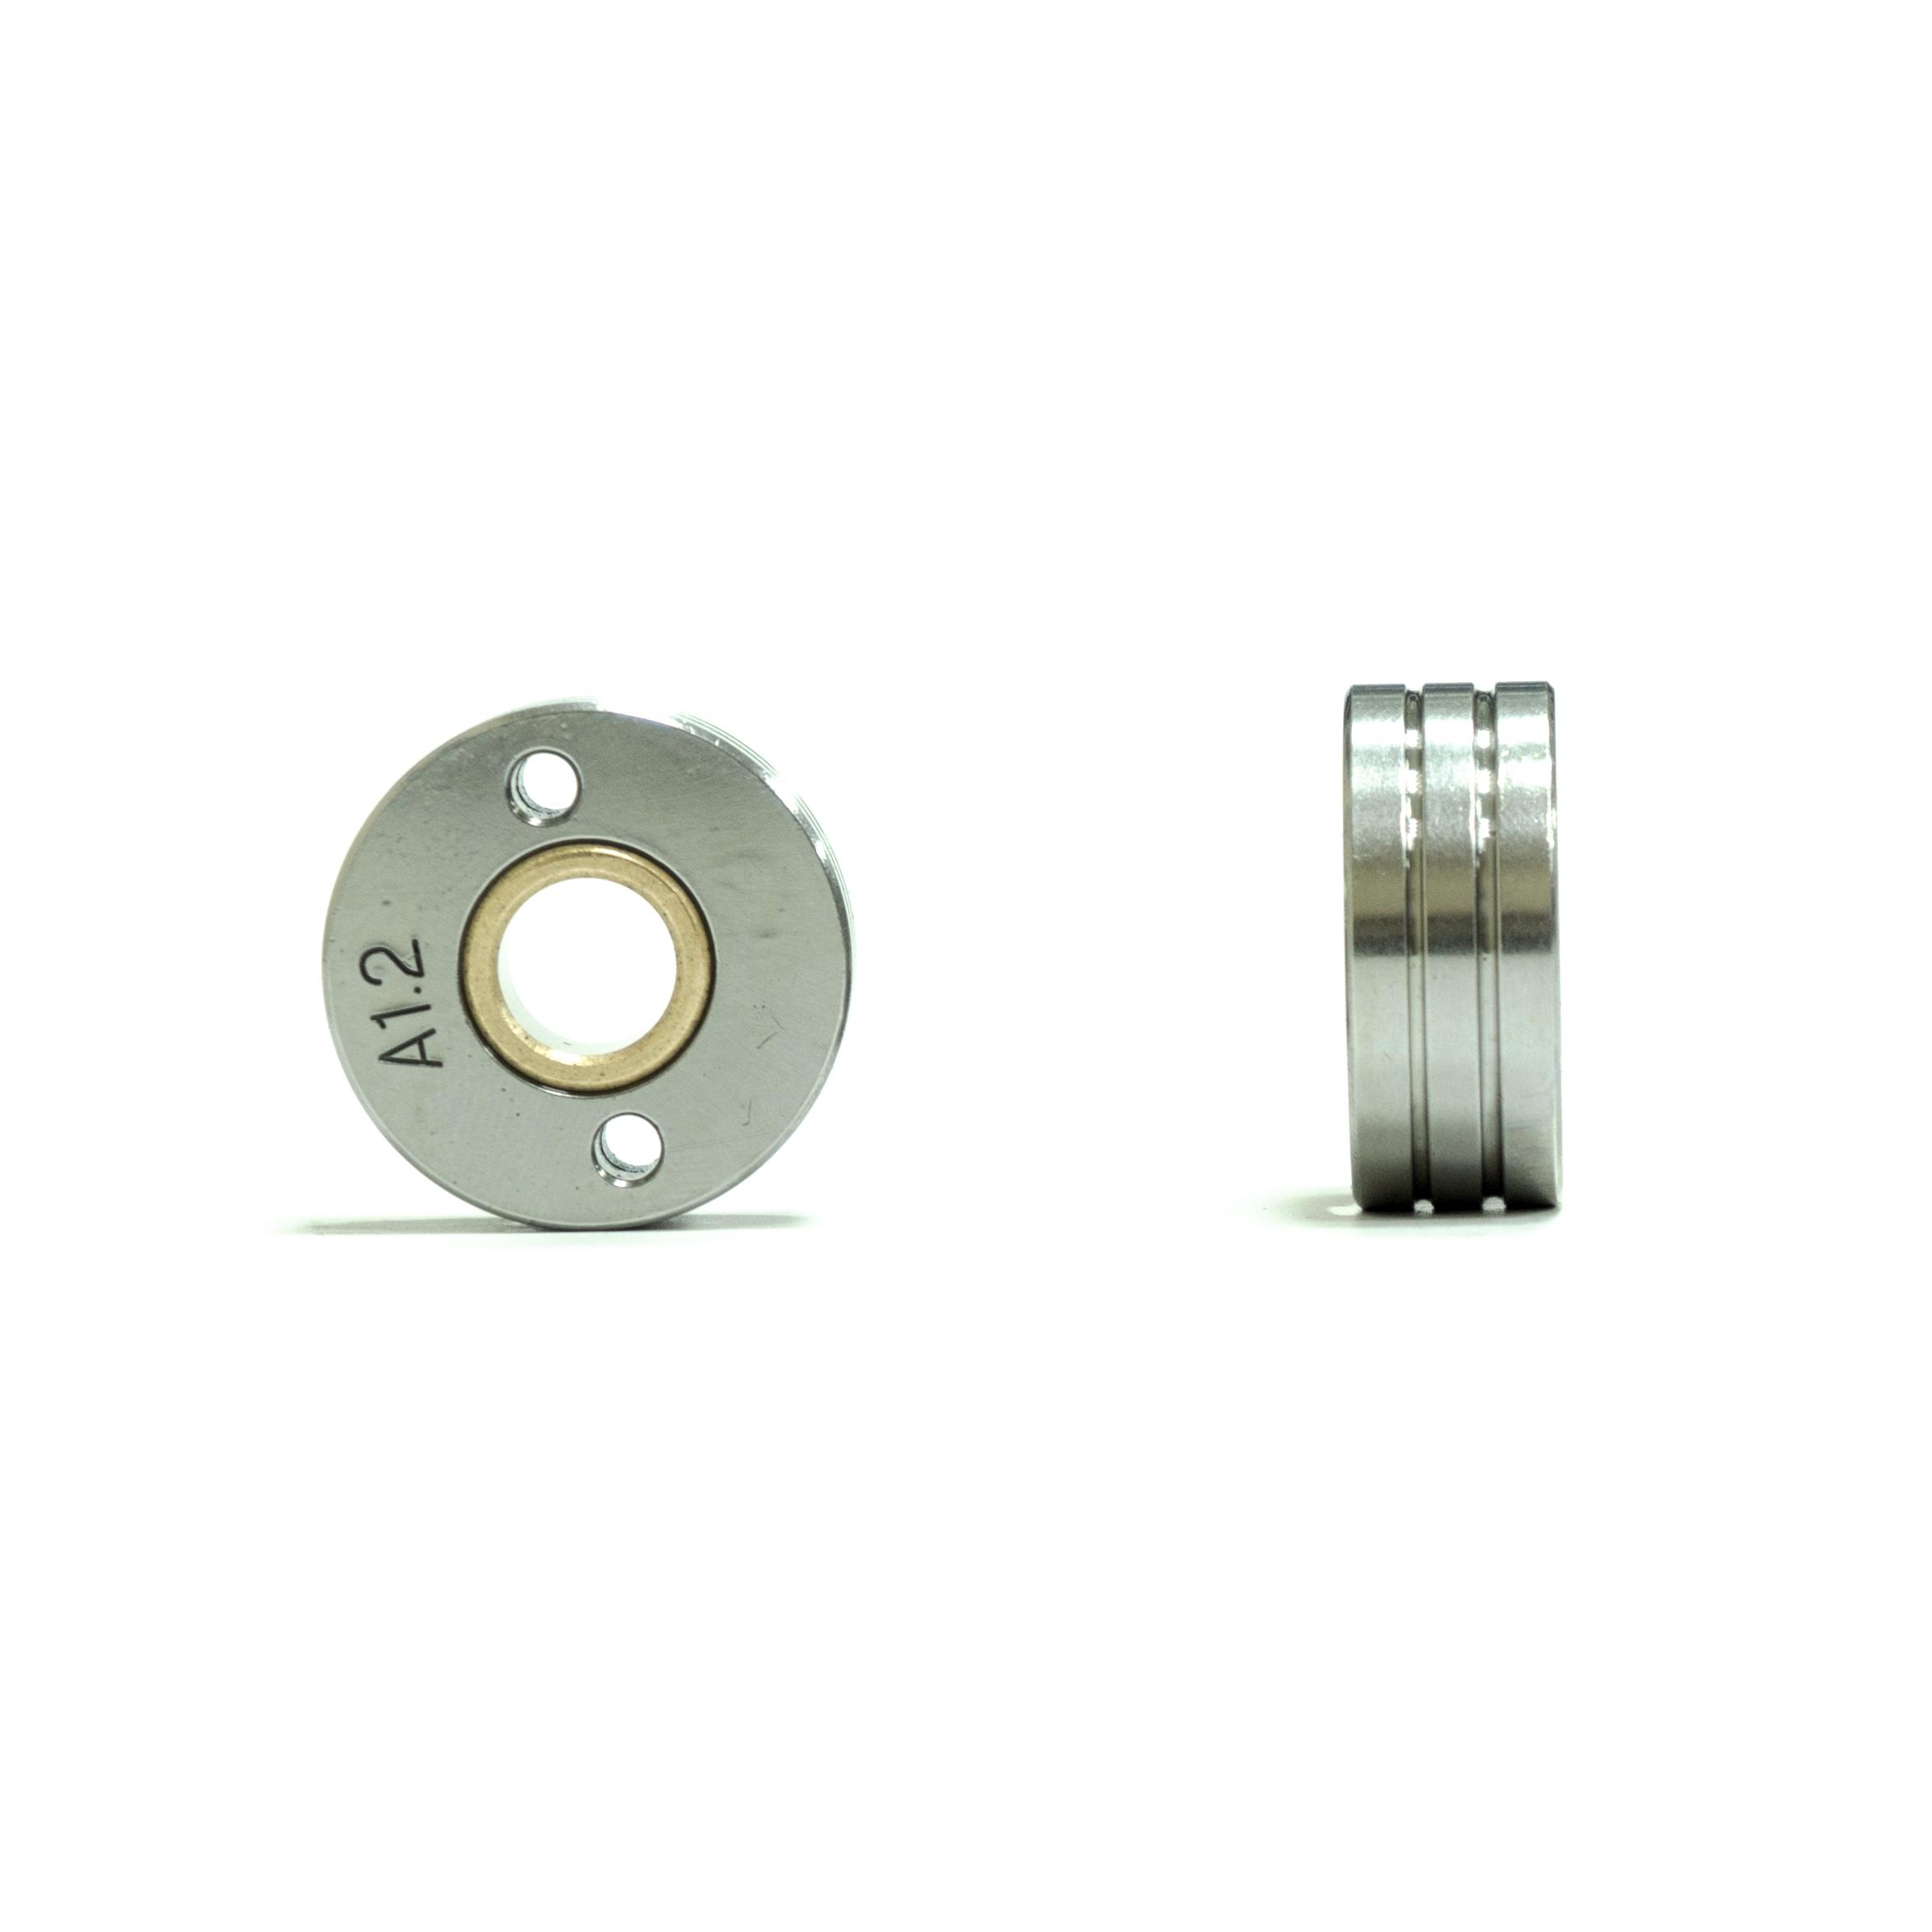 Ролик AL 1.0-1.2мм /SKYWAY 300-330